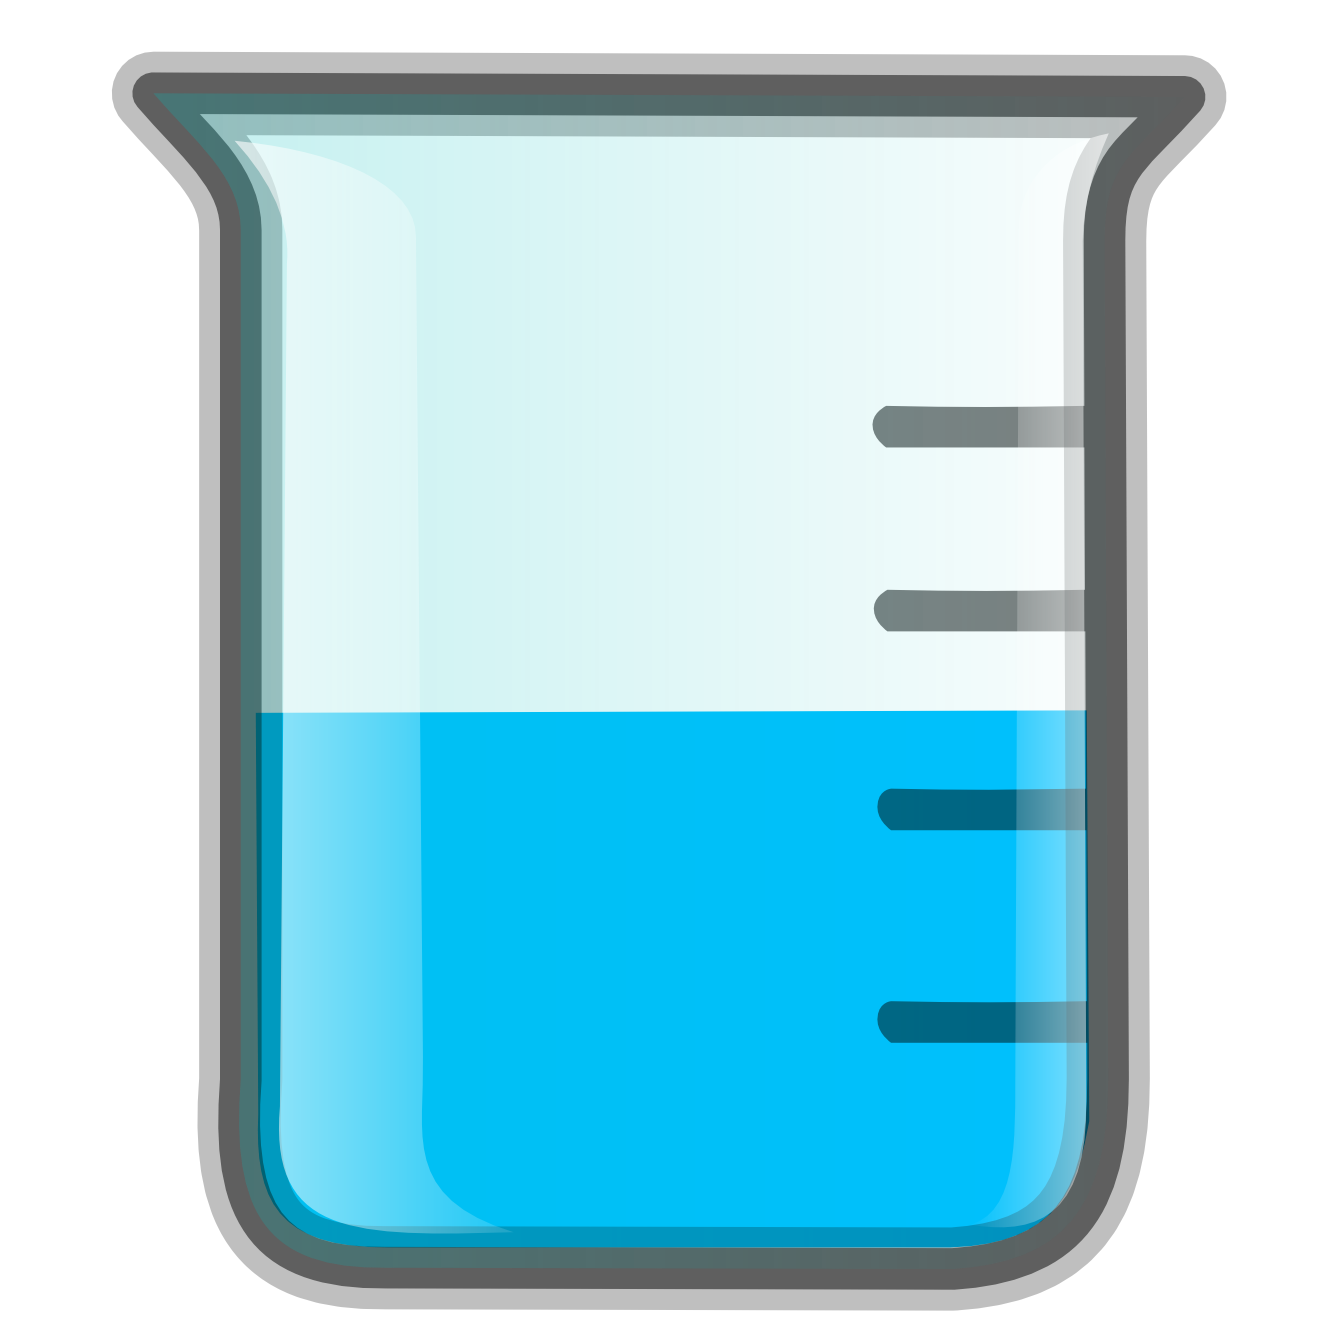 Water In Beaker Clipart.